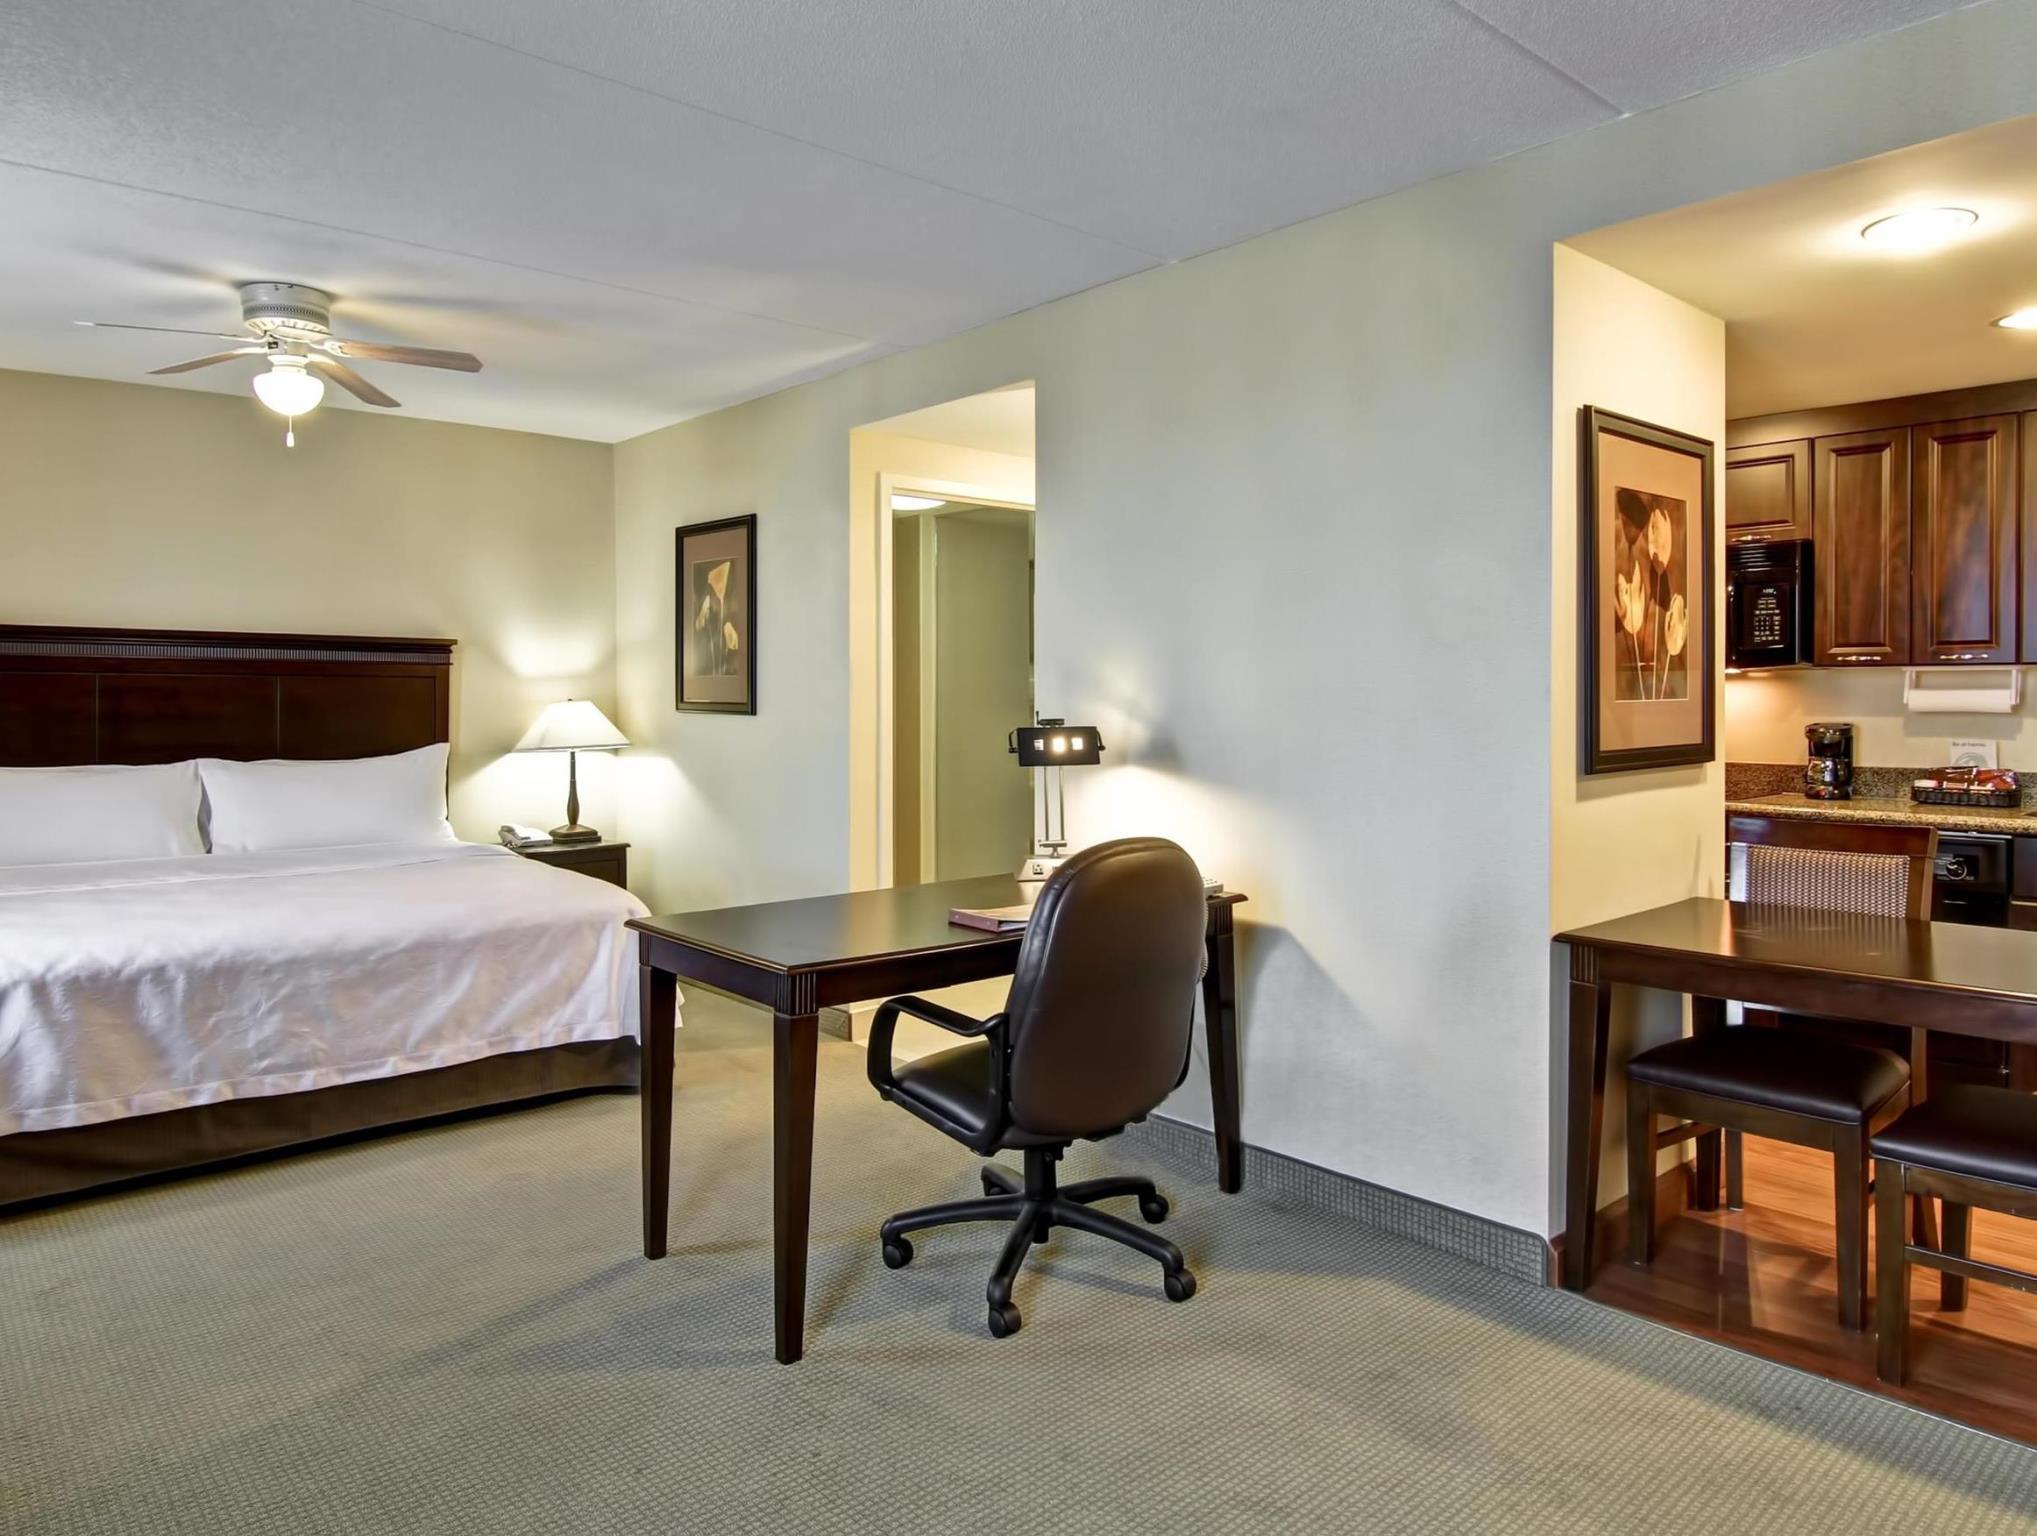 Homewood Suites by Hilton Sudbury, Greater Sudbury